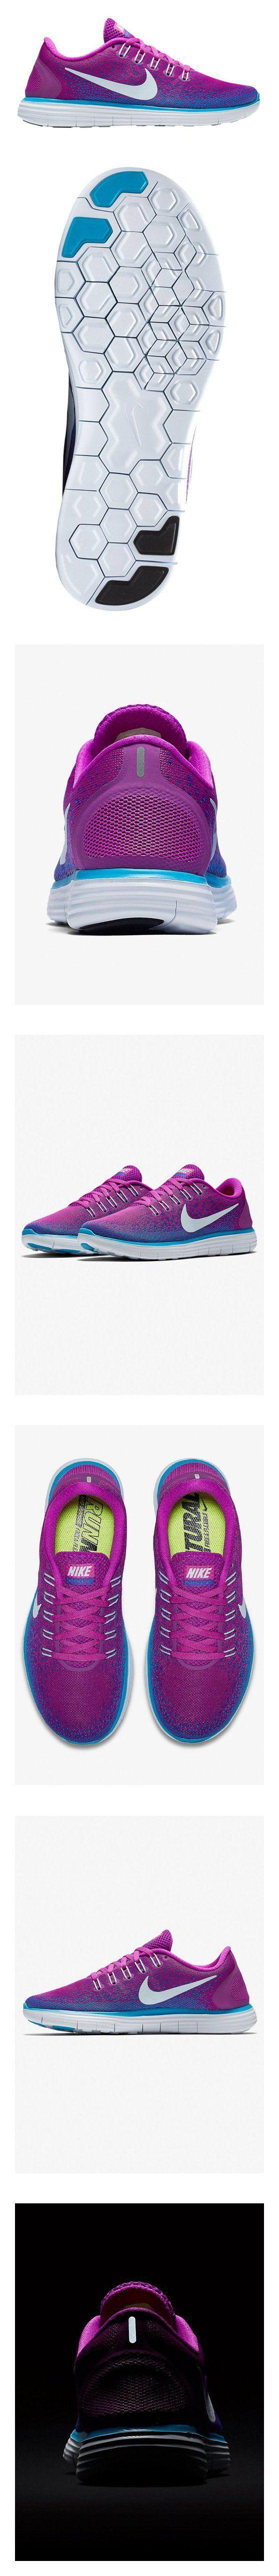 $460.61 - Nike Women's Free RN Distance - HYPR VOLT/BL TINT-FIERCE PRPL-BL LAGOON - 6.5 #shoes #nike #2016